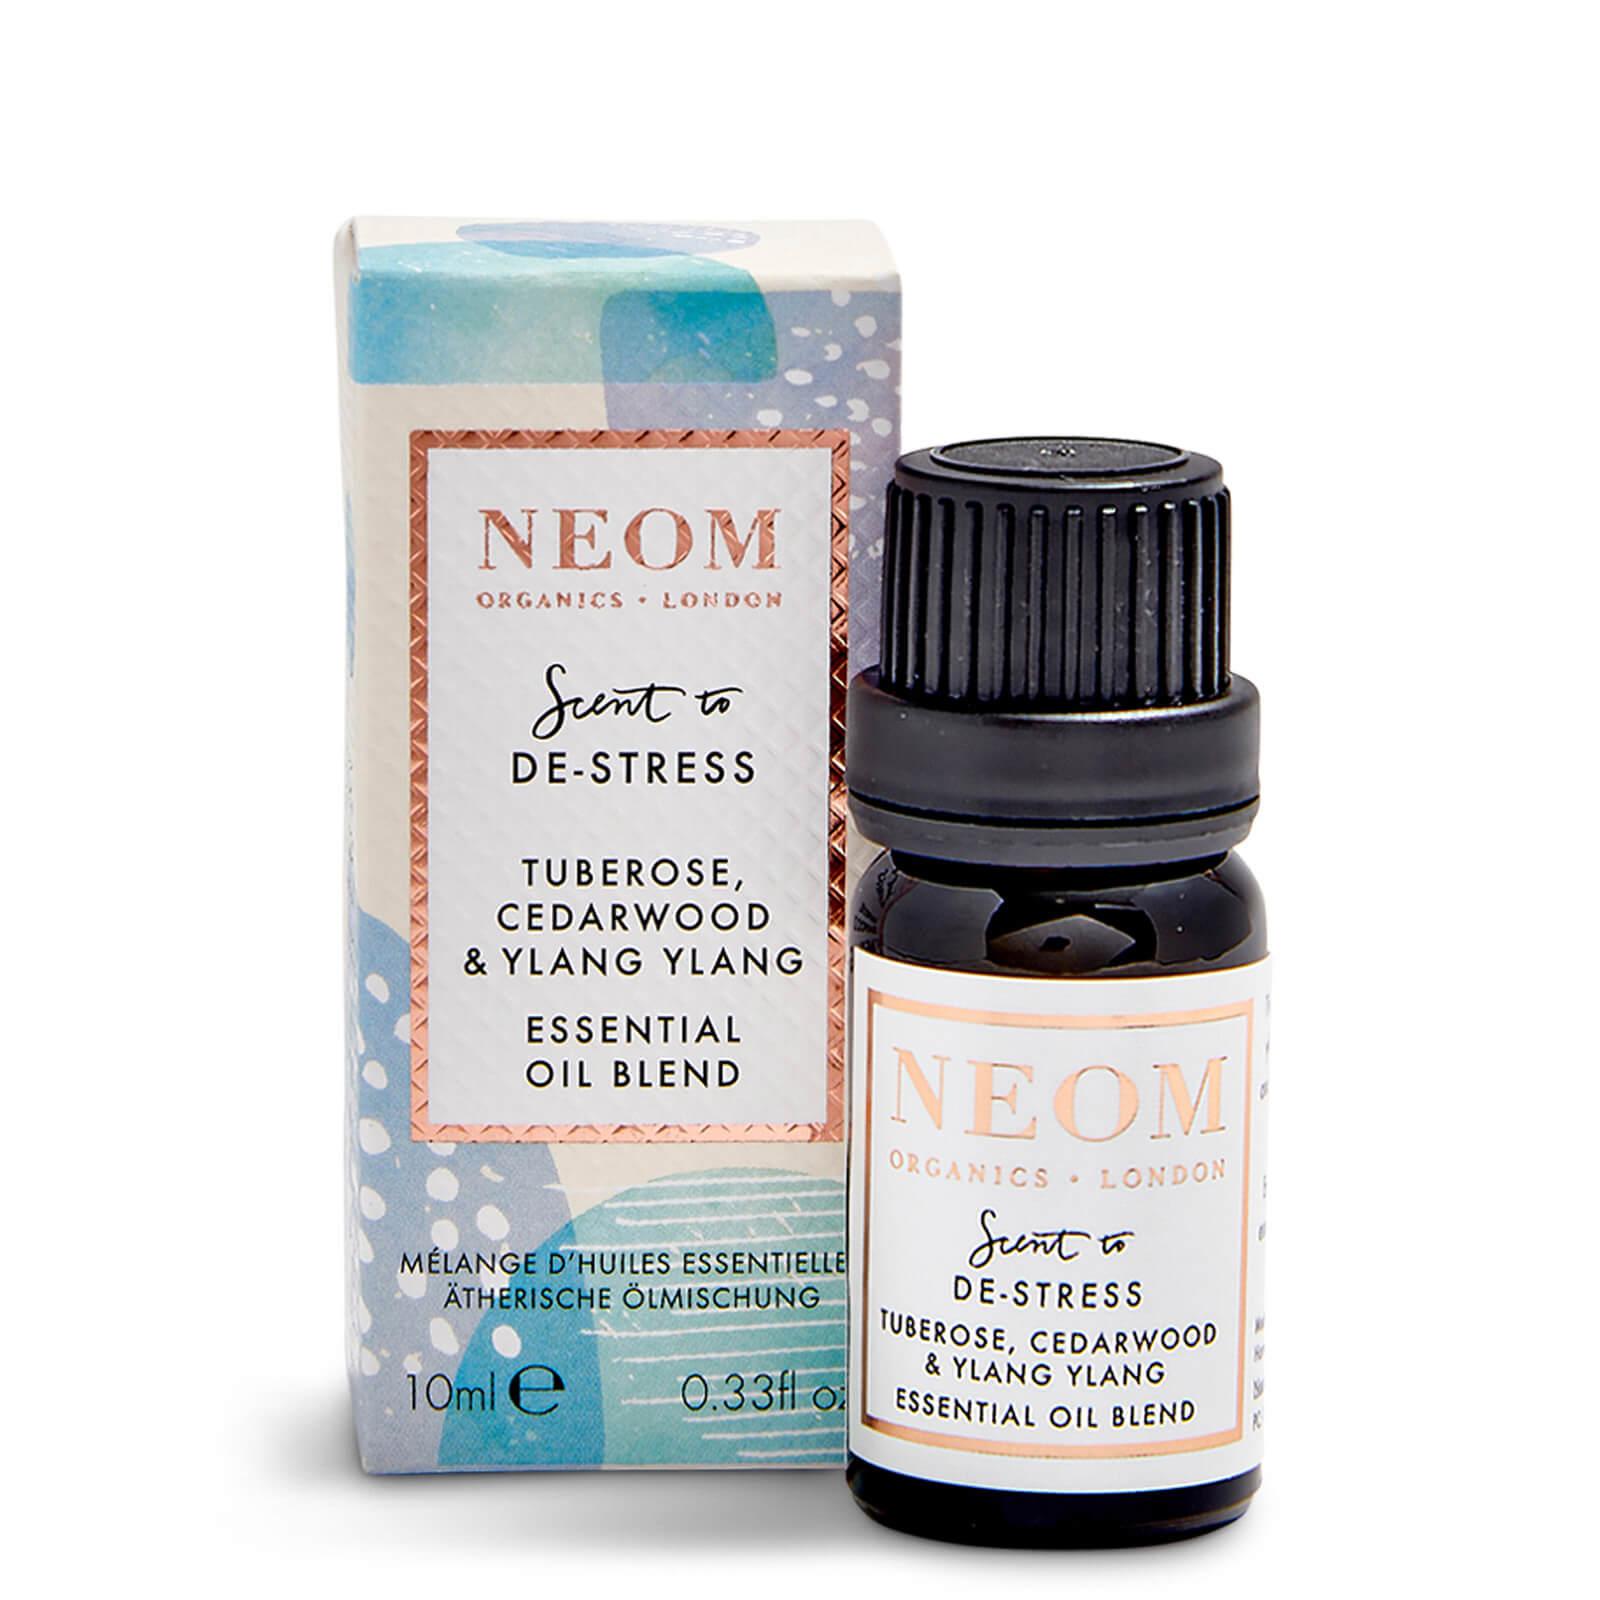 Купить NEOM Tuberose, Cedarwood and Ylang Ylang Essential Oil Blend 10ml